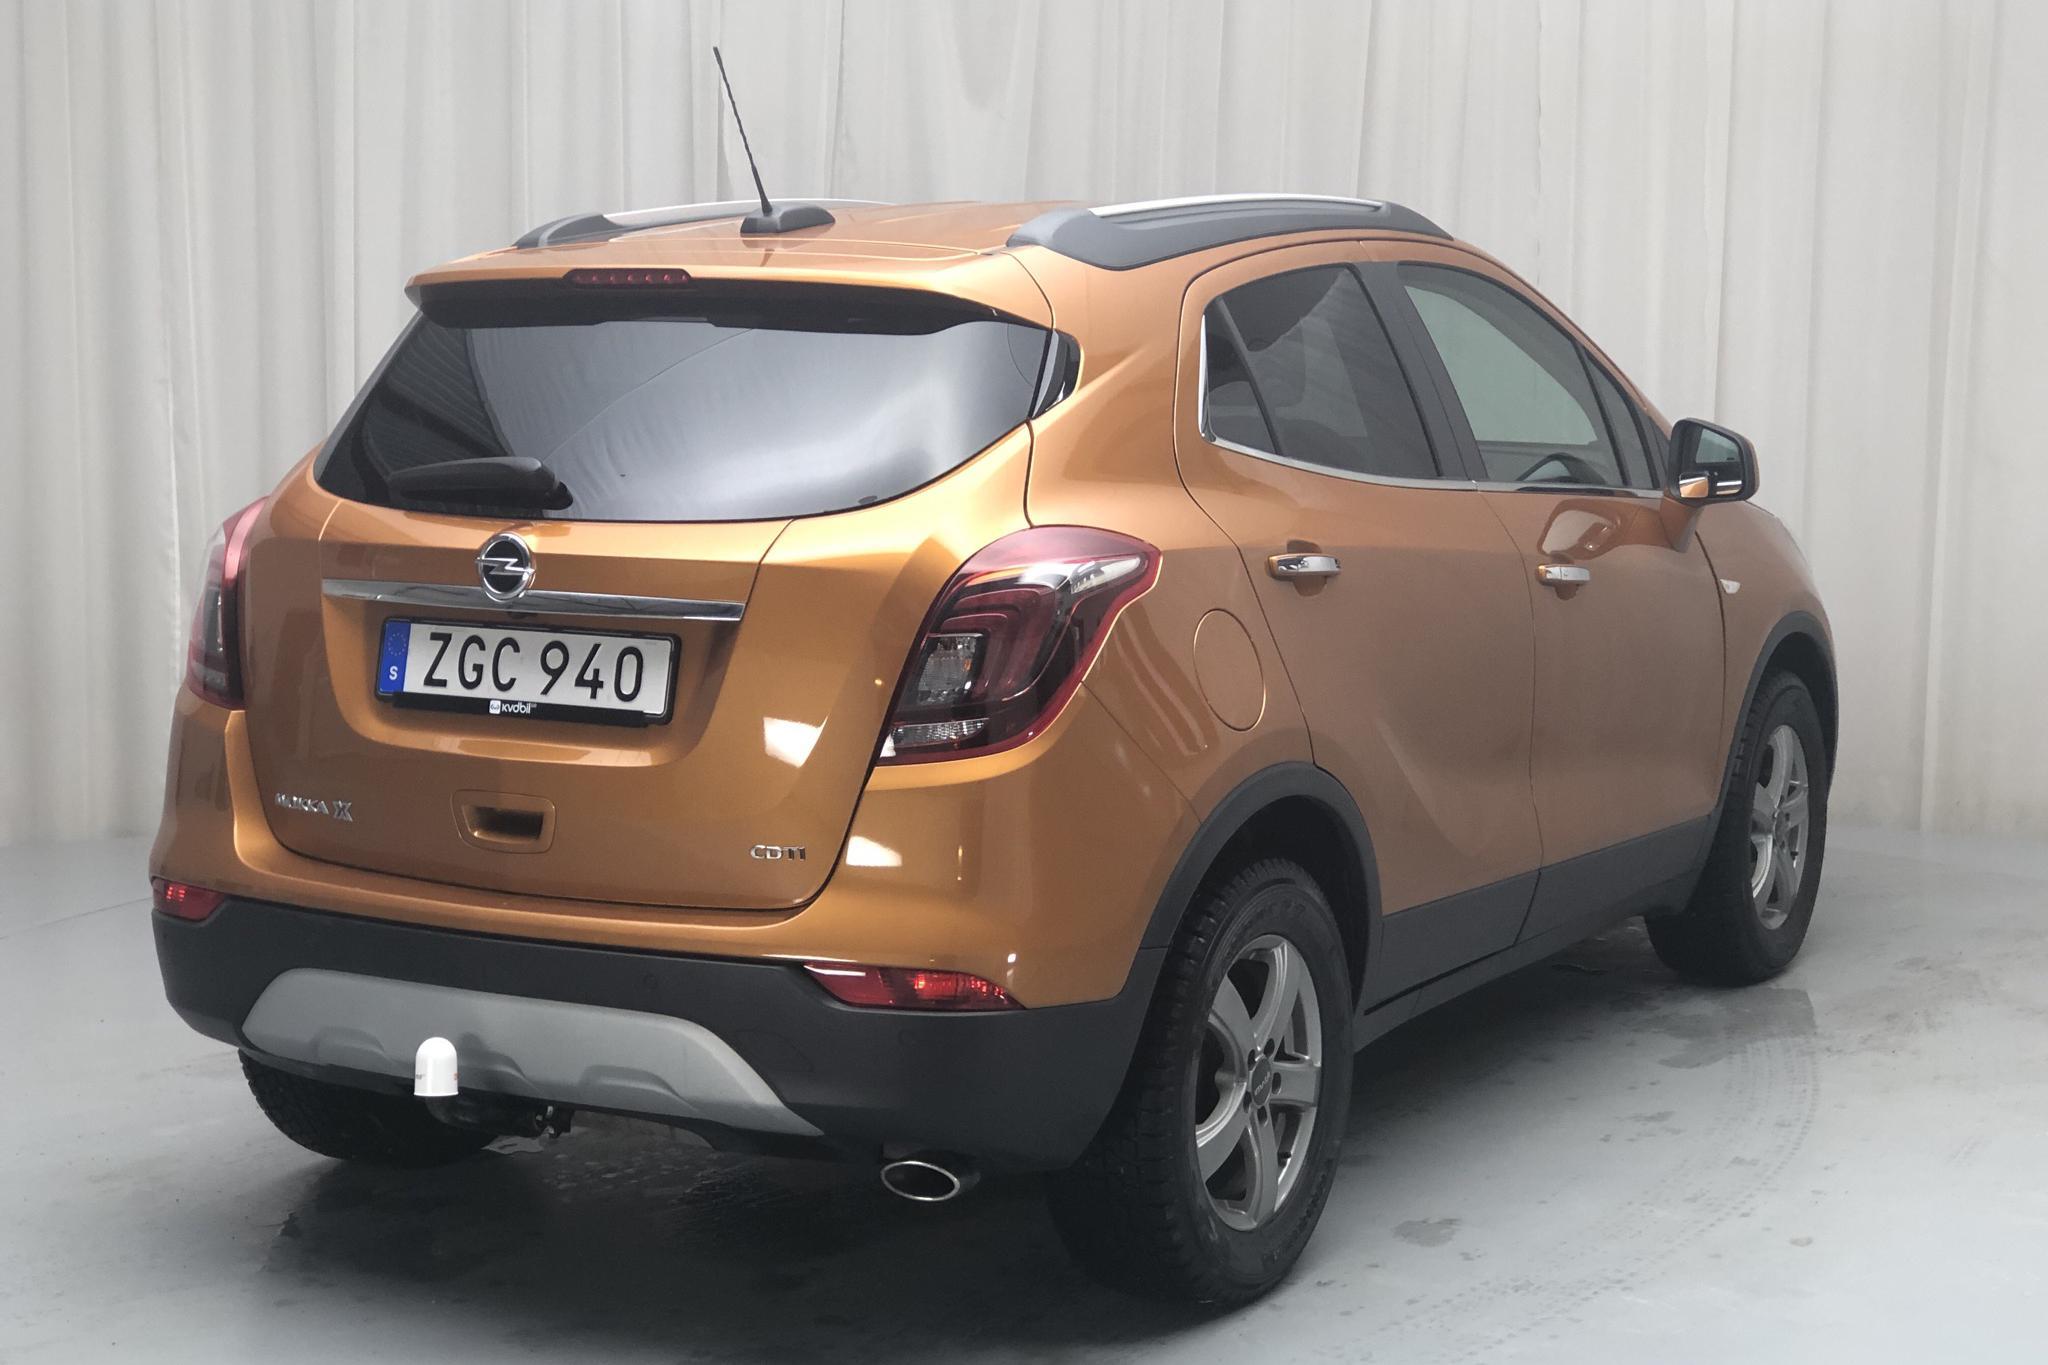 Opel Mokka X 1.6 CDTI ECOTEC (136hk) - 60 860 km - Automatic - orange - 2018